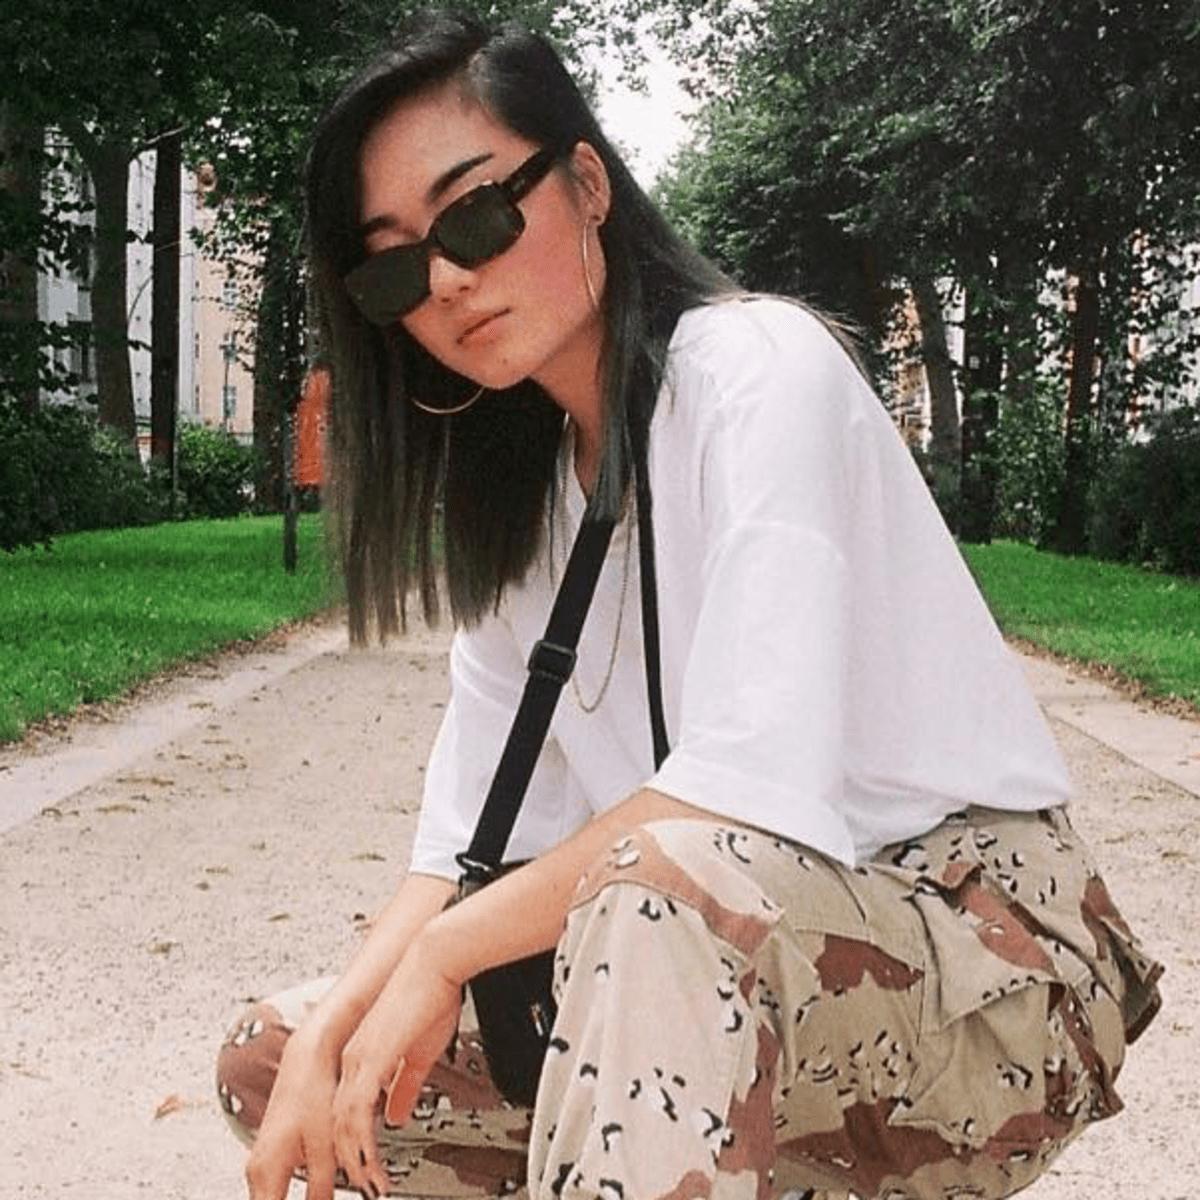 Womens Streetwear Influencers to Follow on Instagram - Fashionista